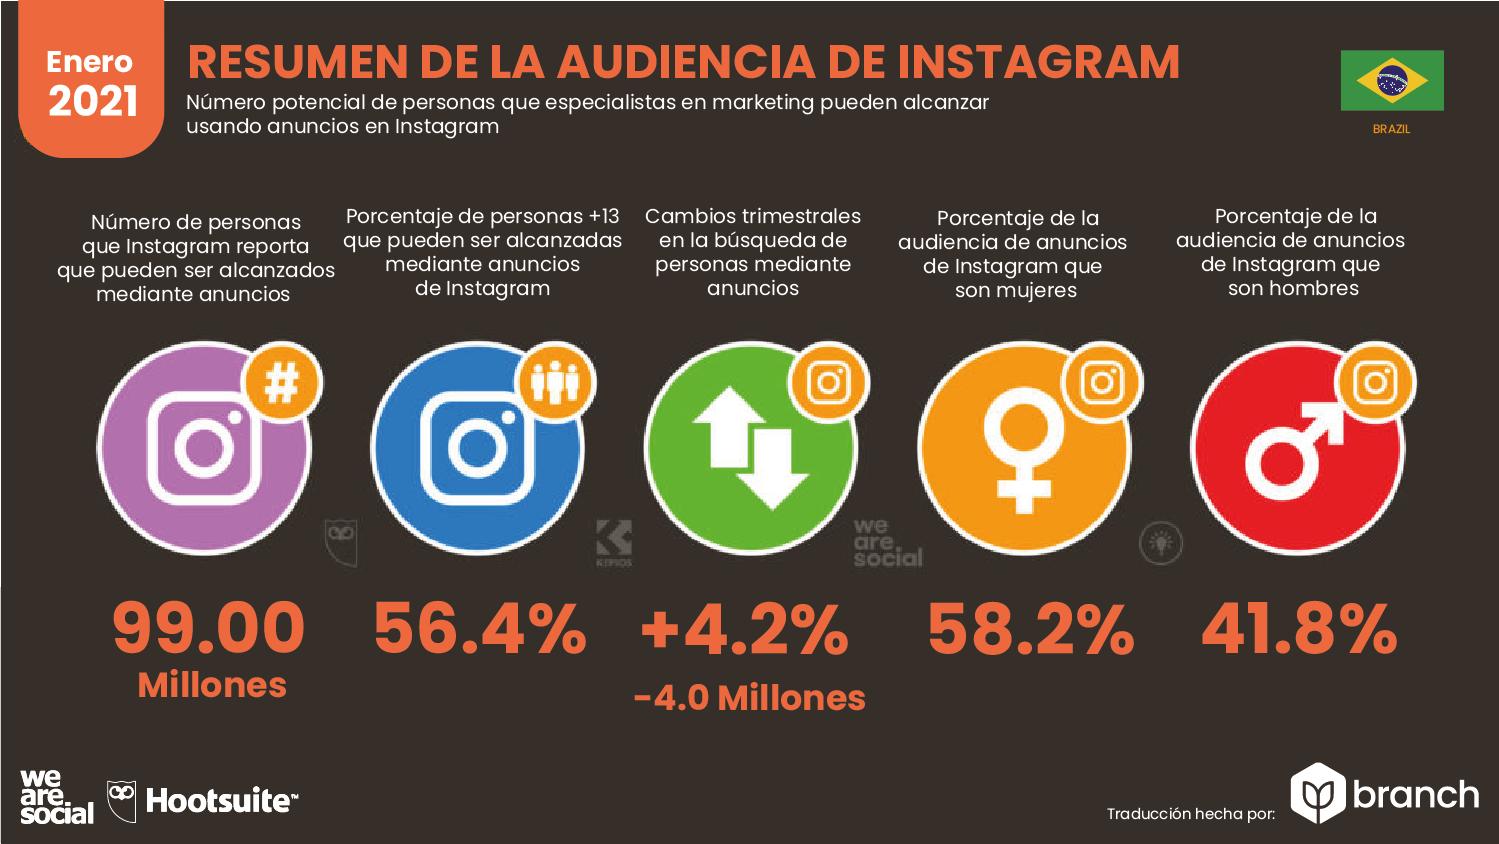 audiencia-de-instagram-en-brasil-2020-2021